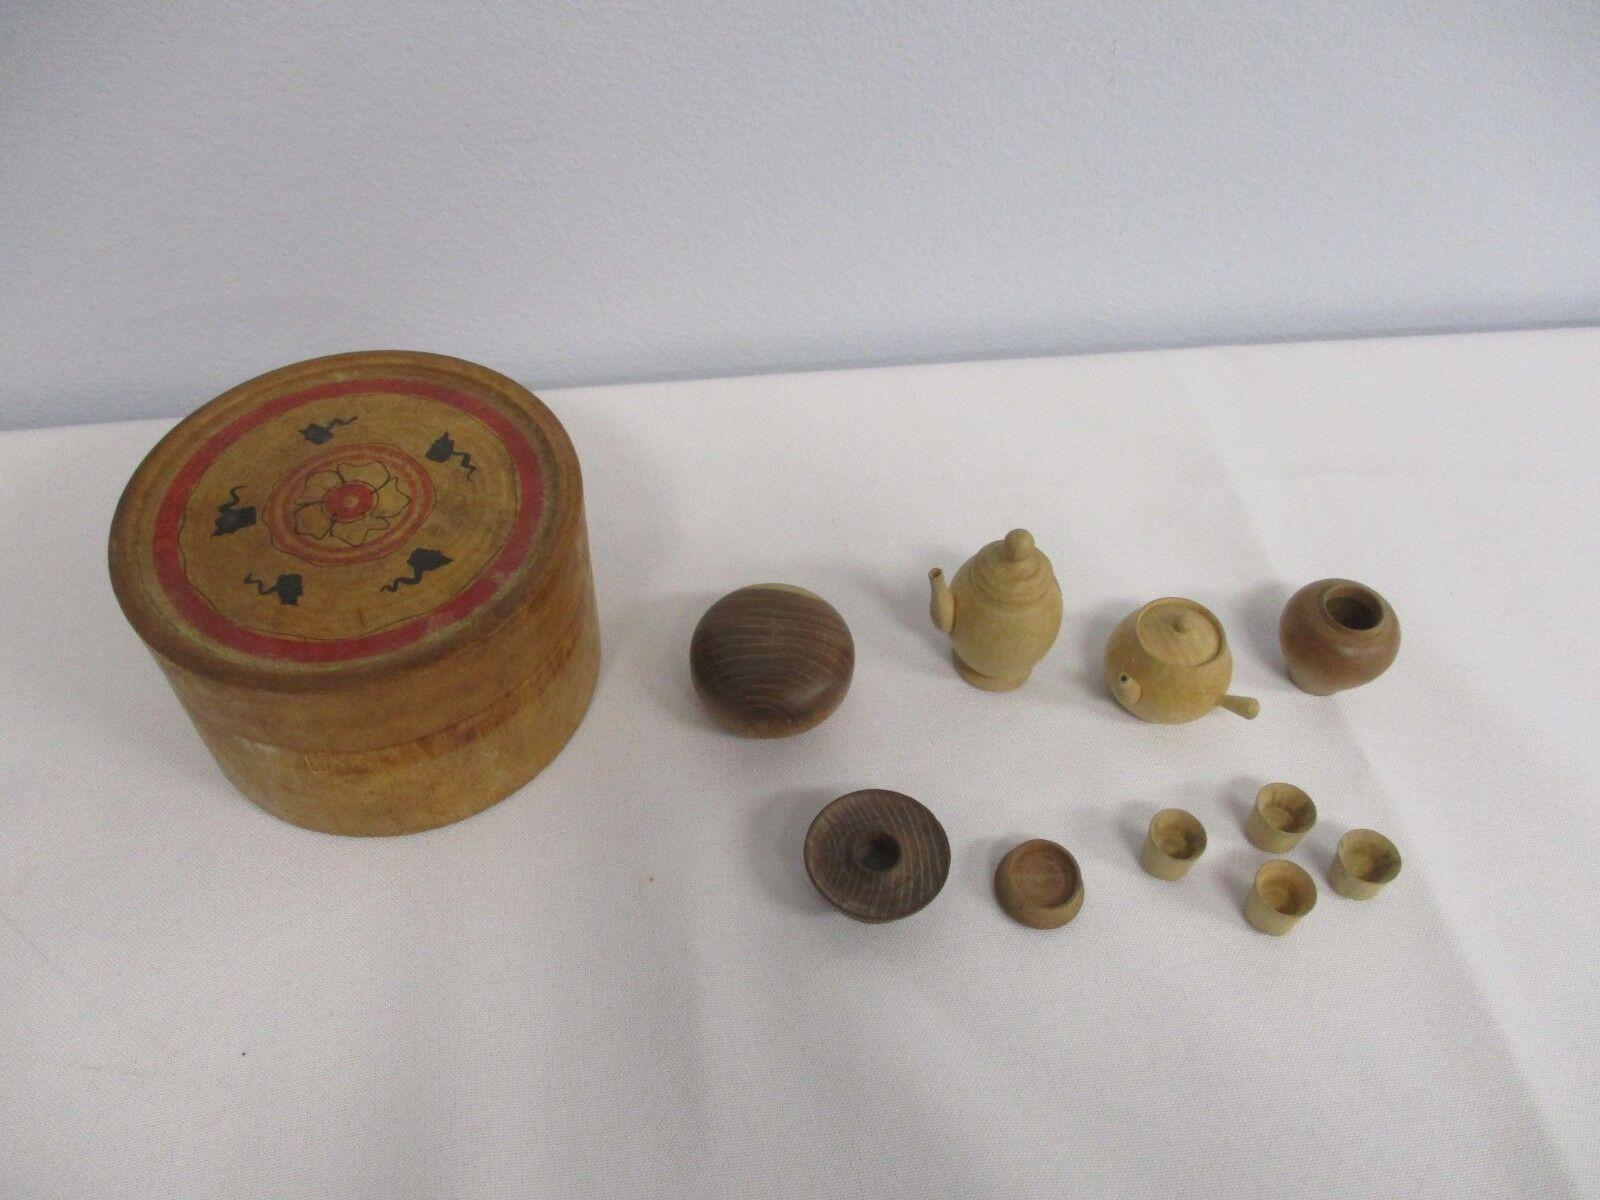 Antigua Mano 1920 Madera Torneada juego de té en miniatura en caja de cubierta